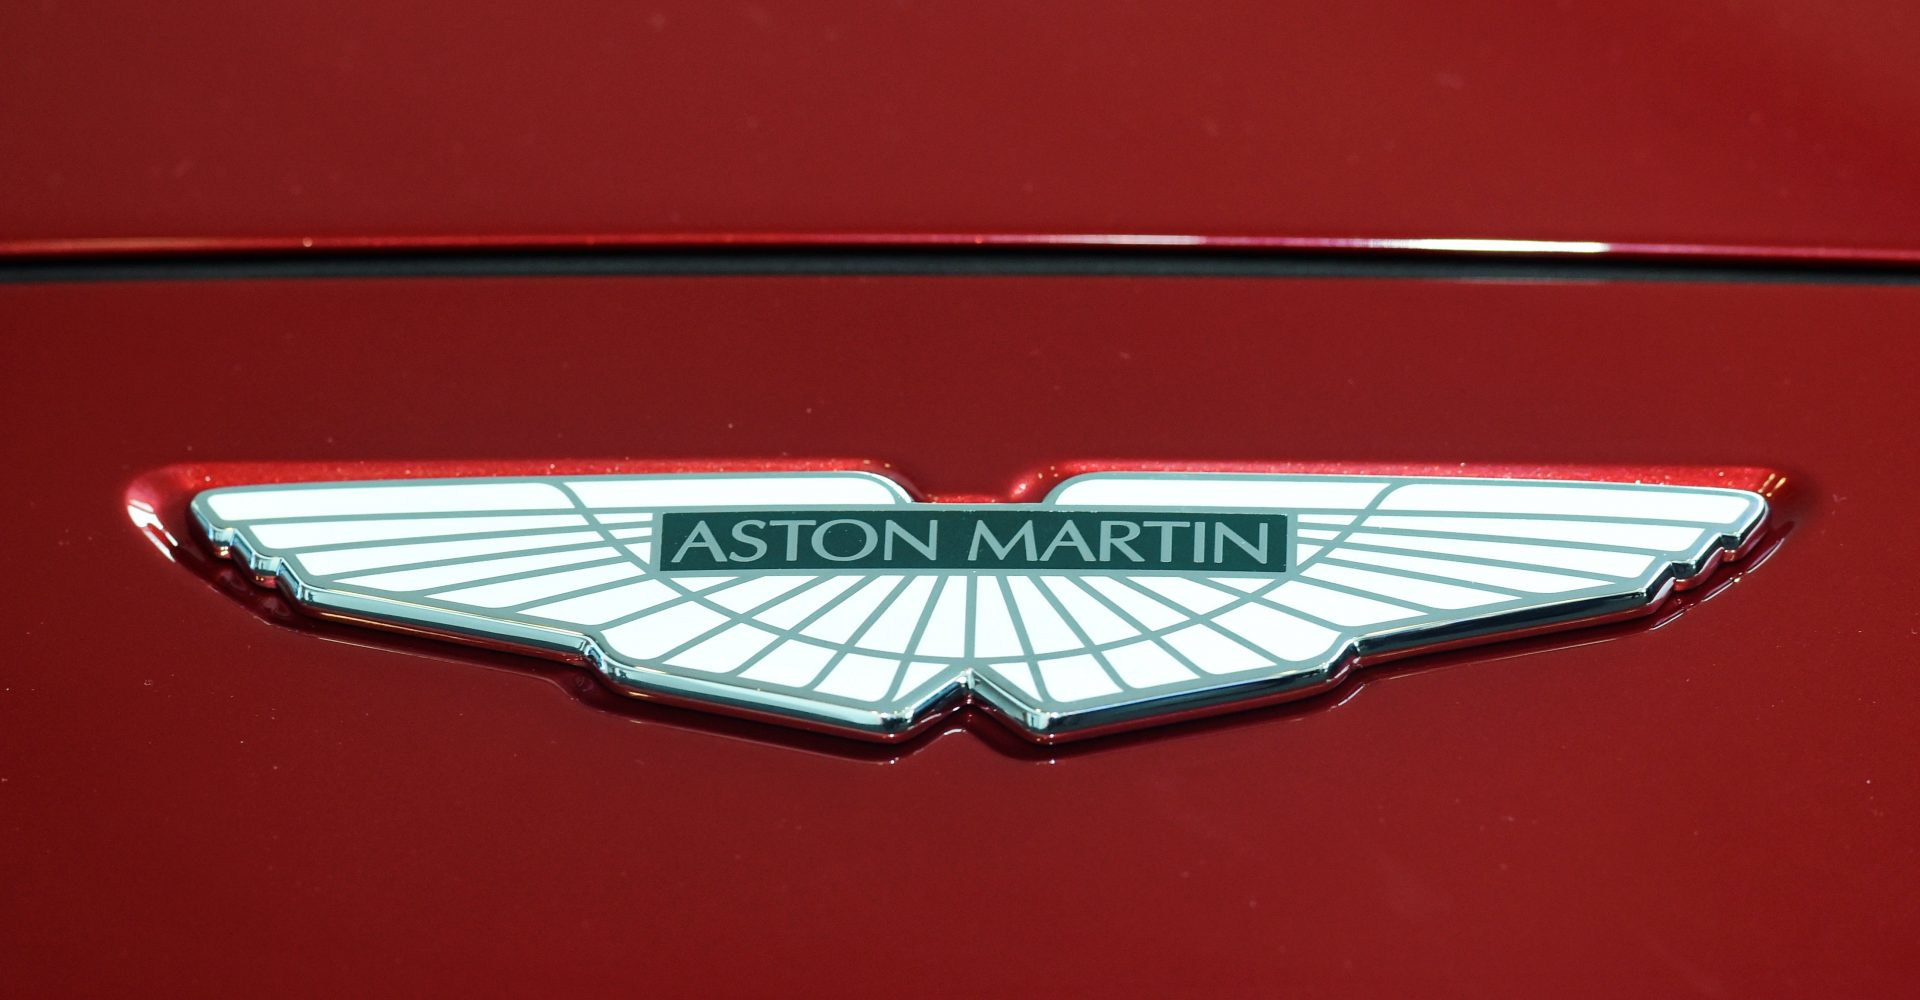 Aston Martin to slash up to 500 jobs as car sales plunge